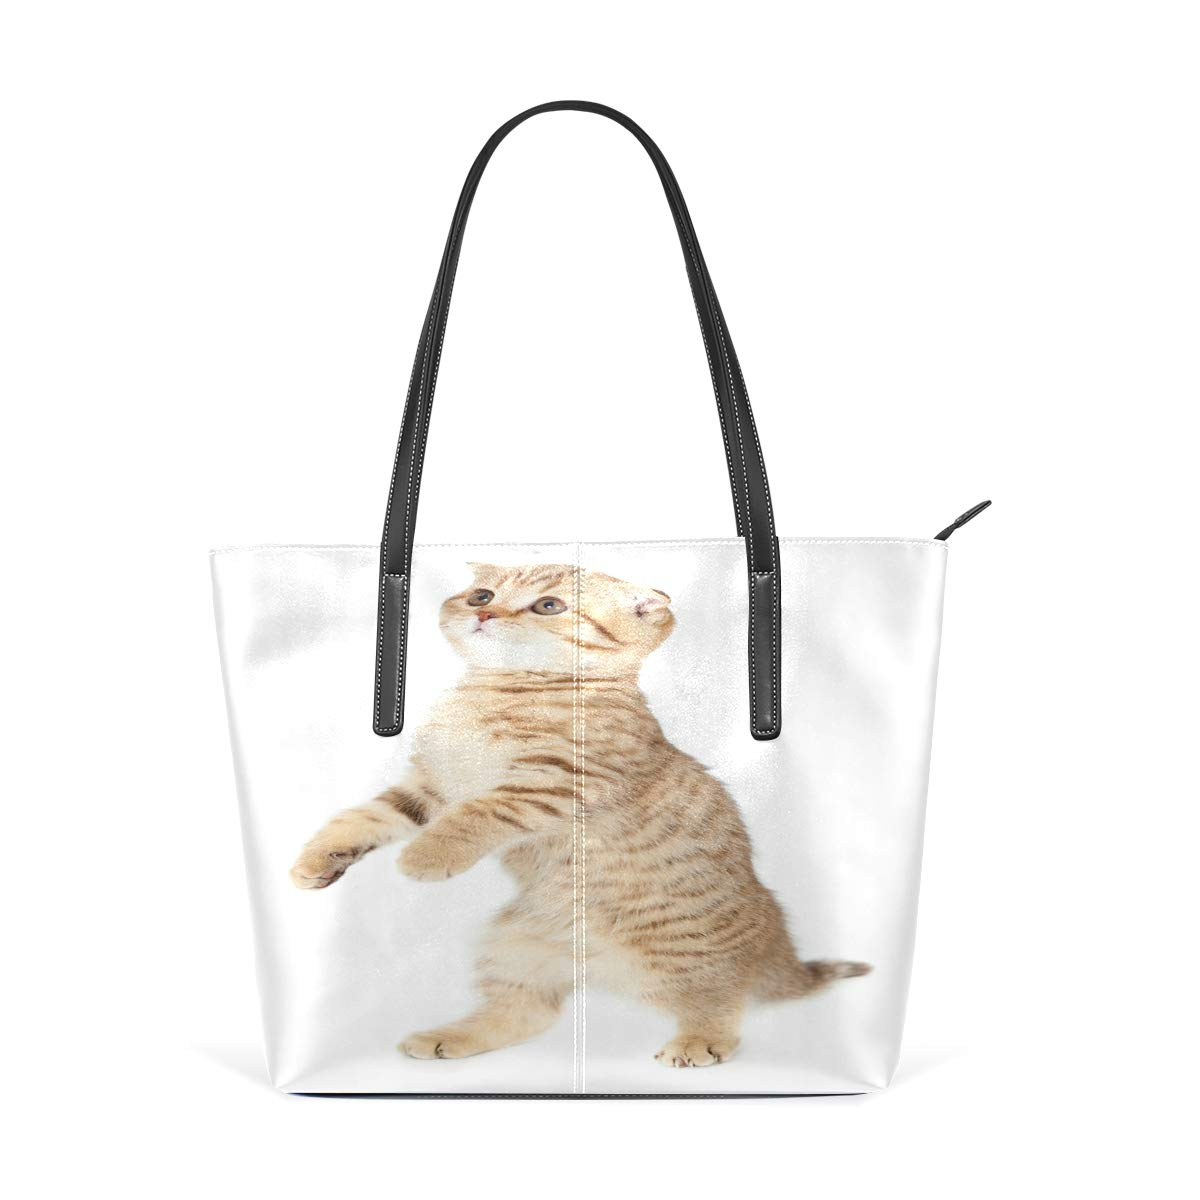 Cat 3D Funny Womens PU Leather Tote Shoulder Bags Handbags Casual Bag